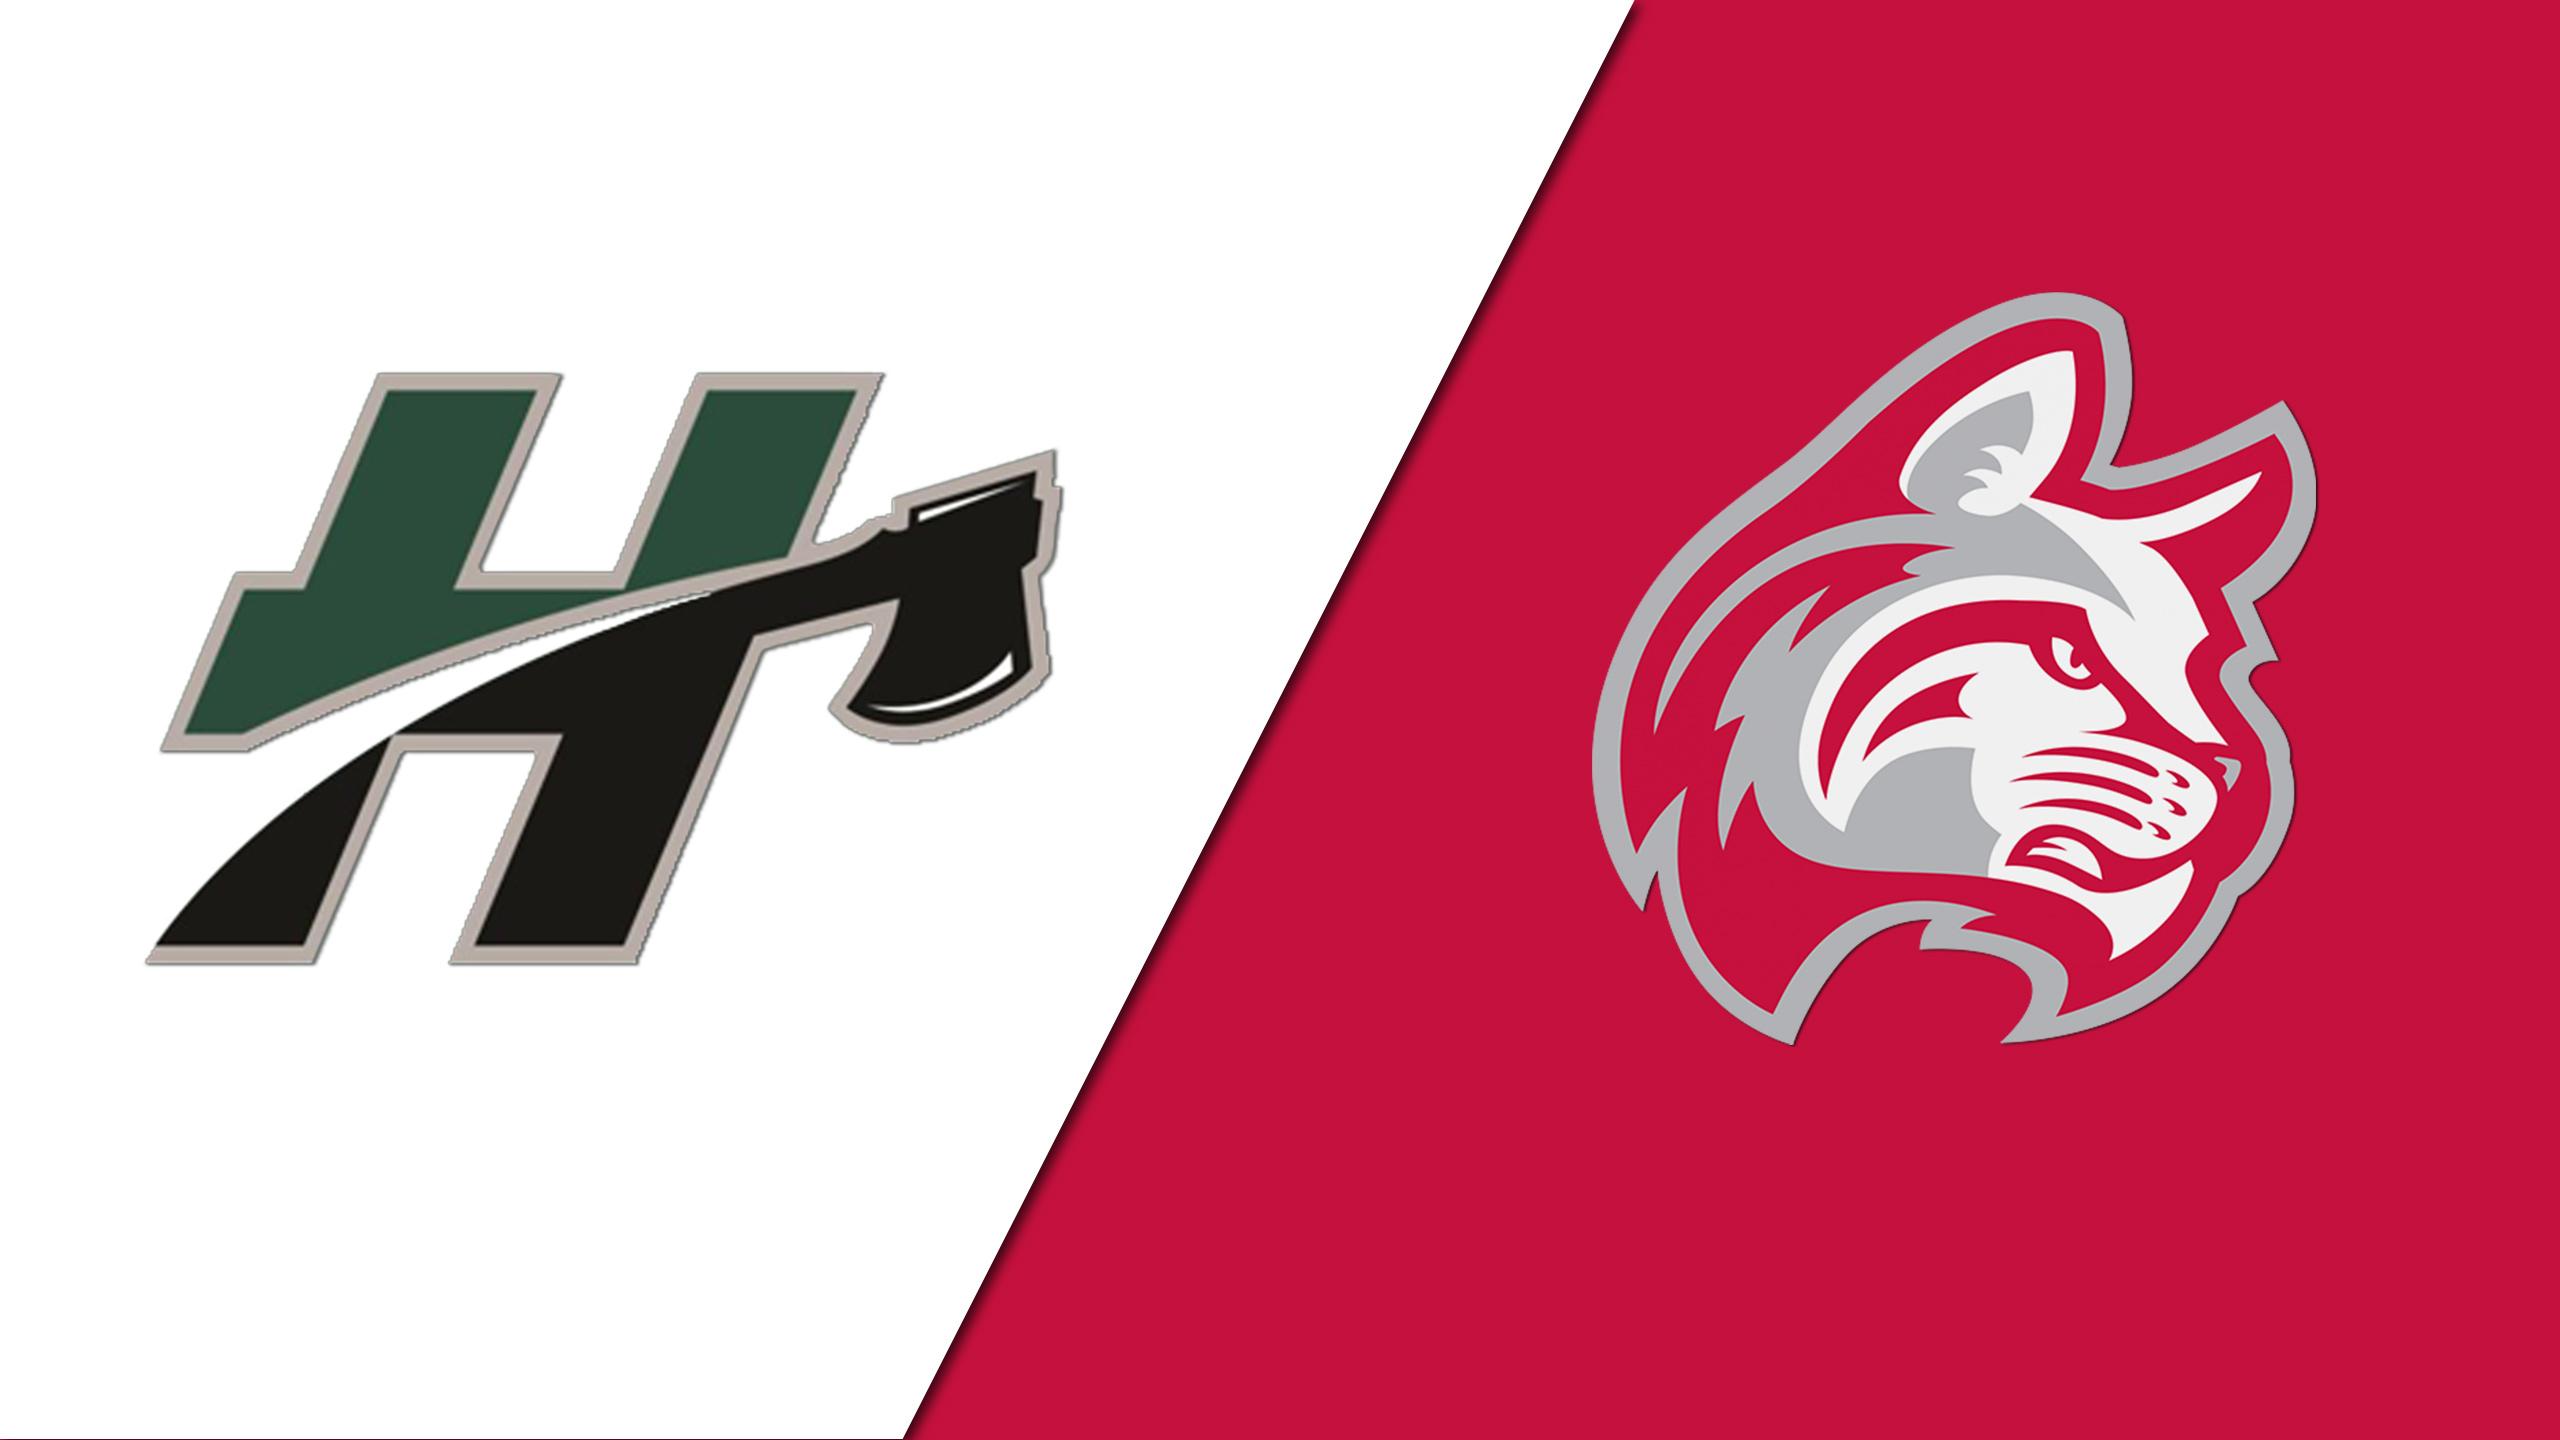 Huntington (IN) vs. Indiana Wesleyan (Quarterfinals)